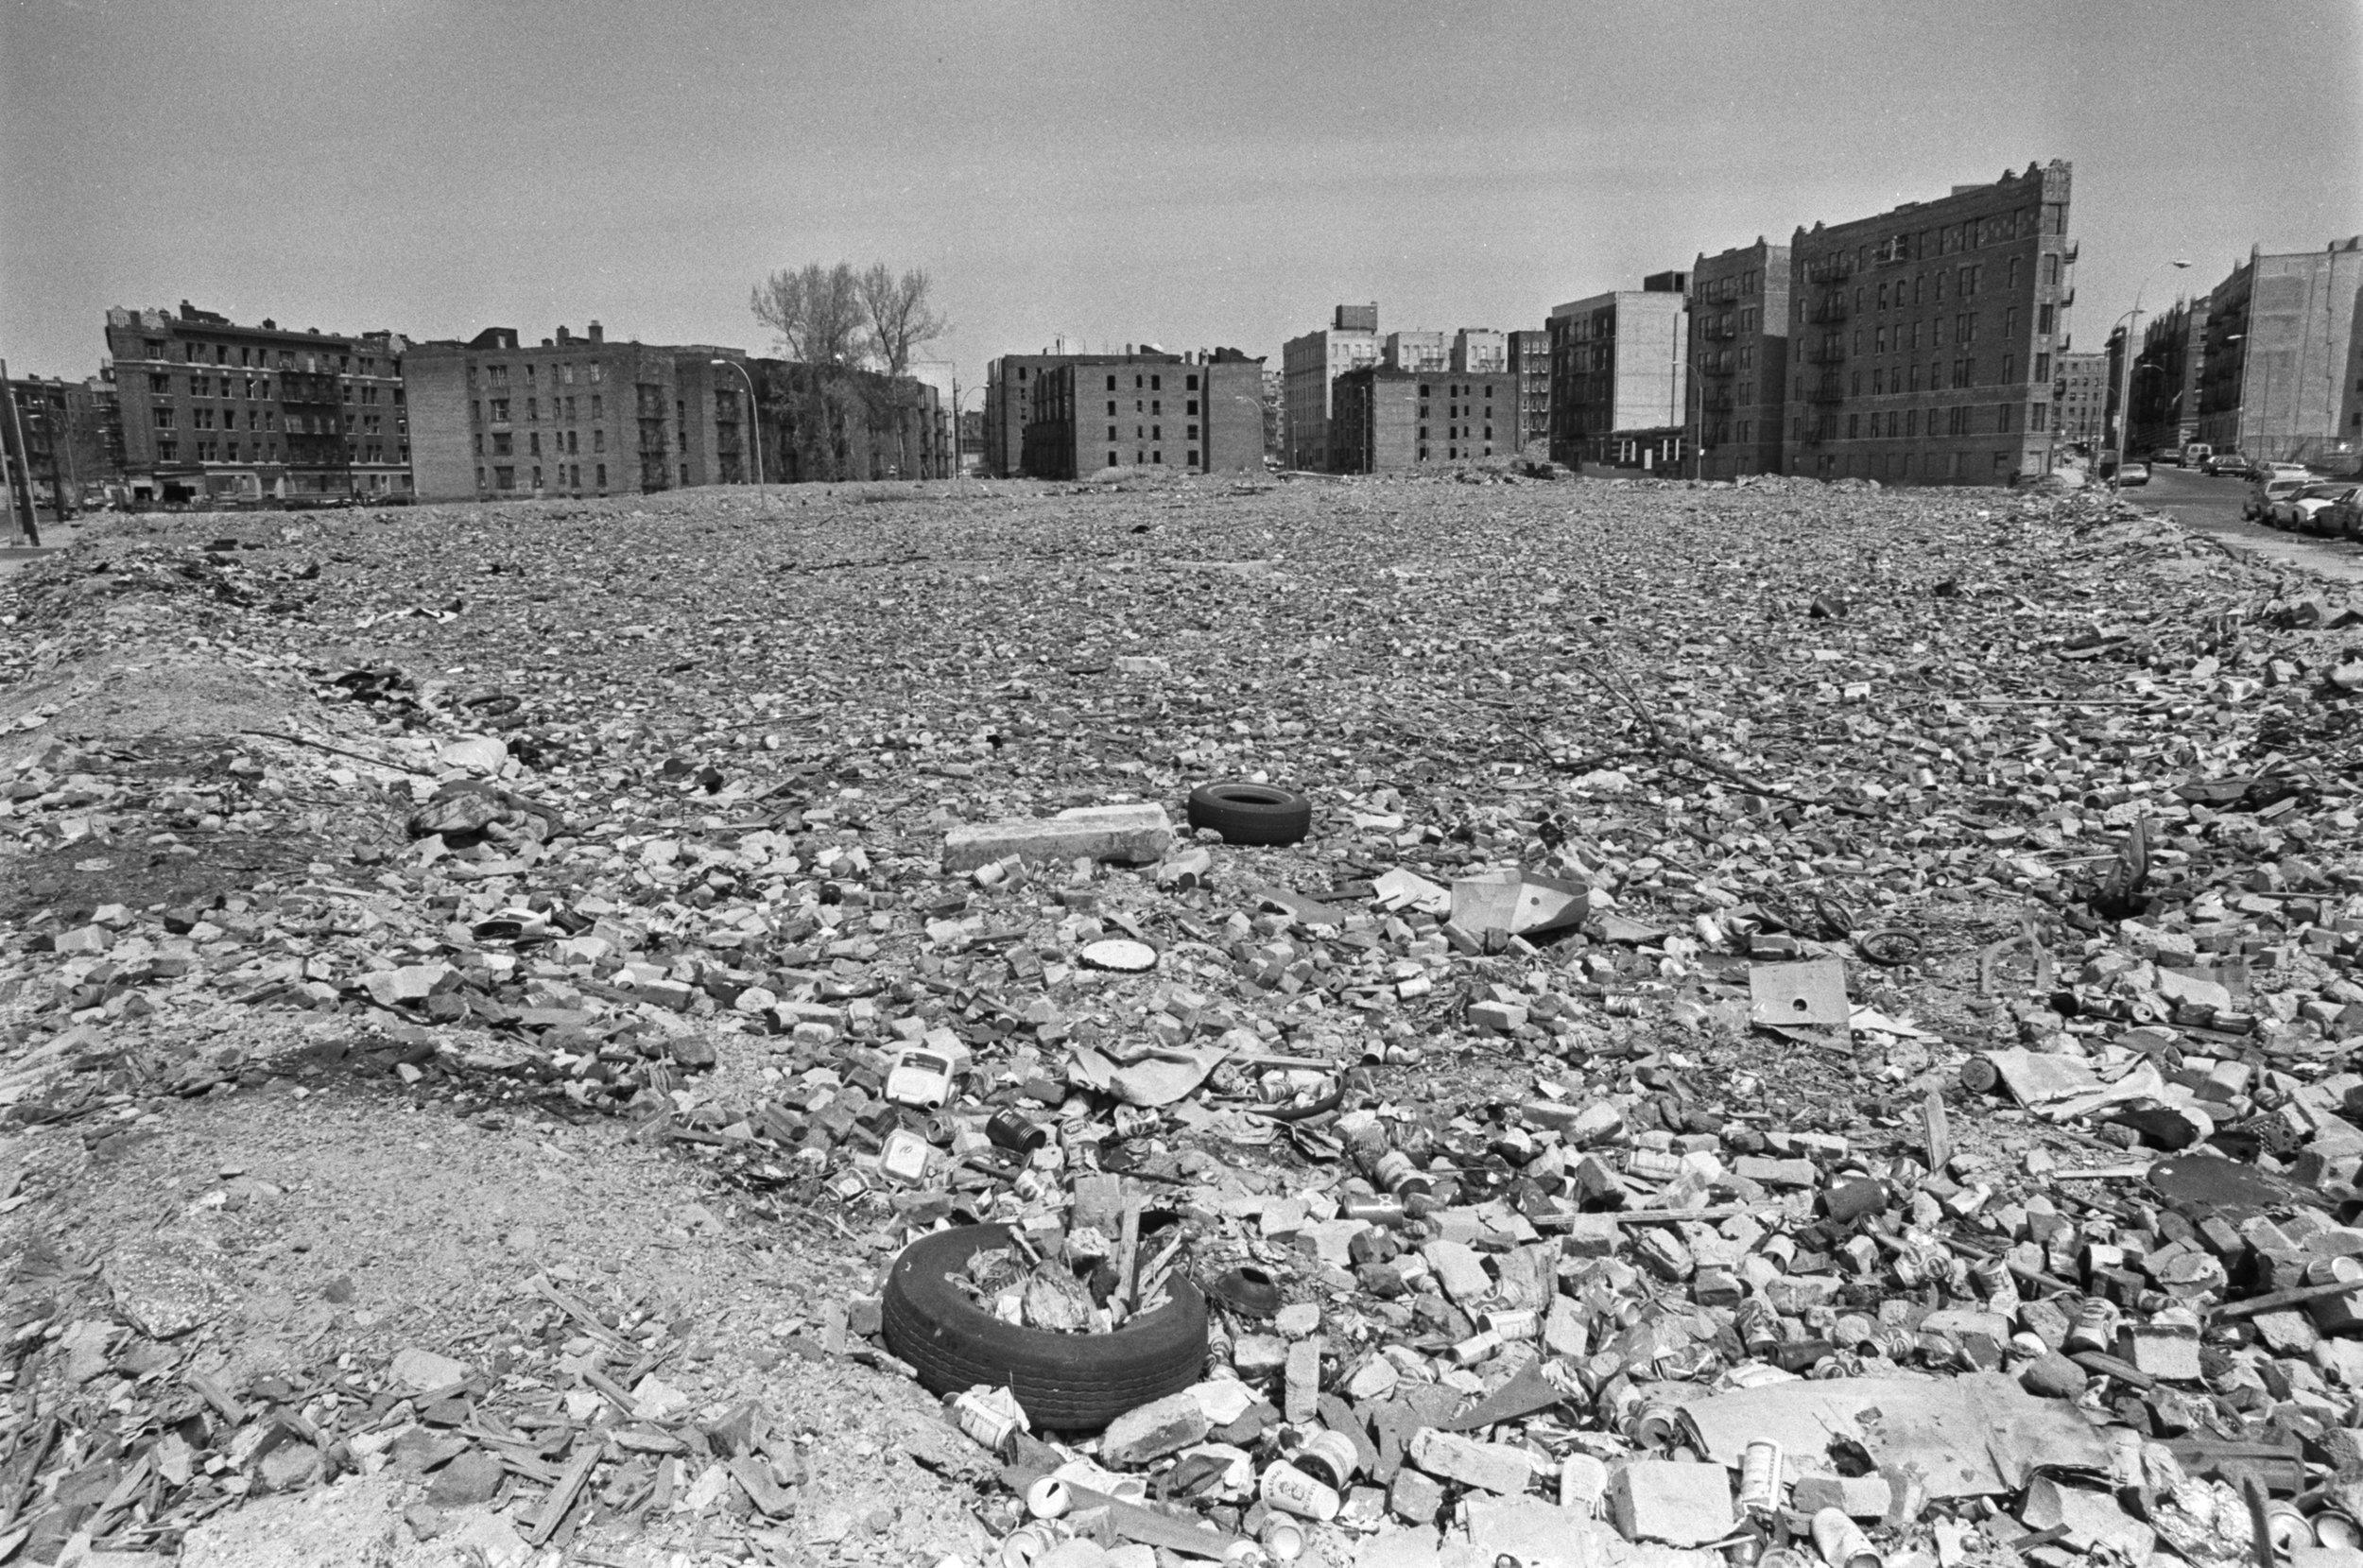 Interim Park, Bronx. Vacant lot for future Interim Park site, April 1980. Photograph by Paul Rice.